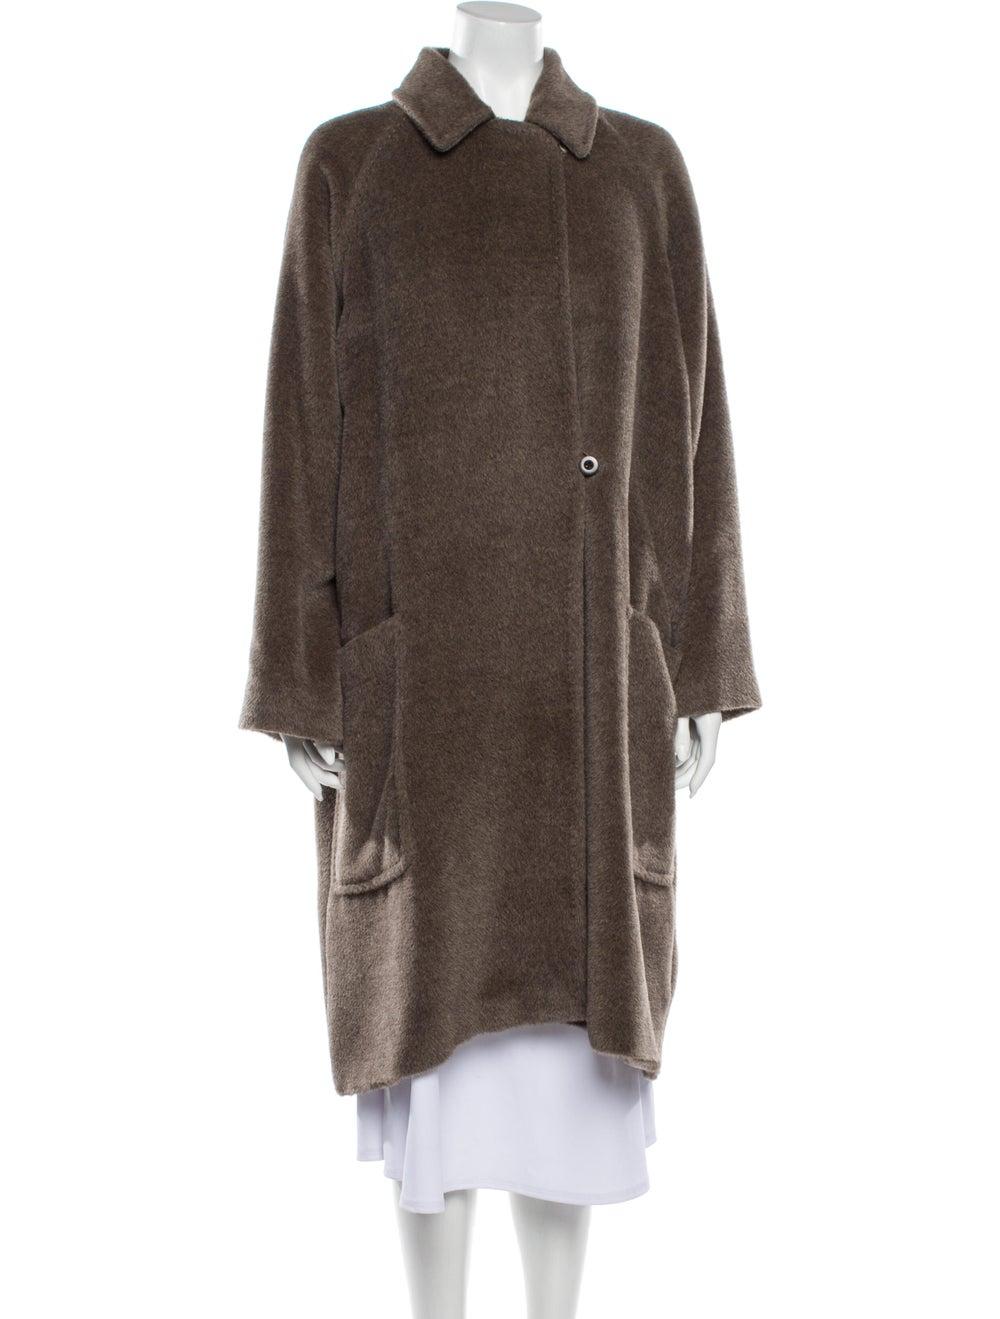 Max Mara Alpaca Coat - image 4